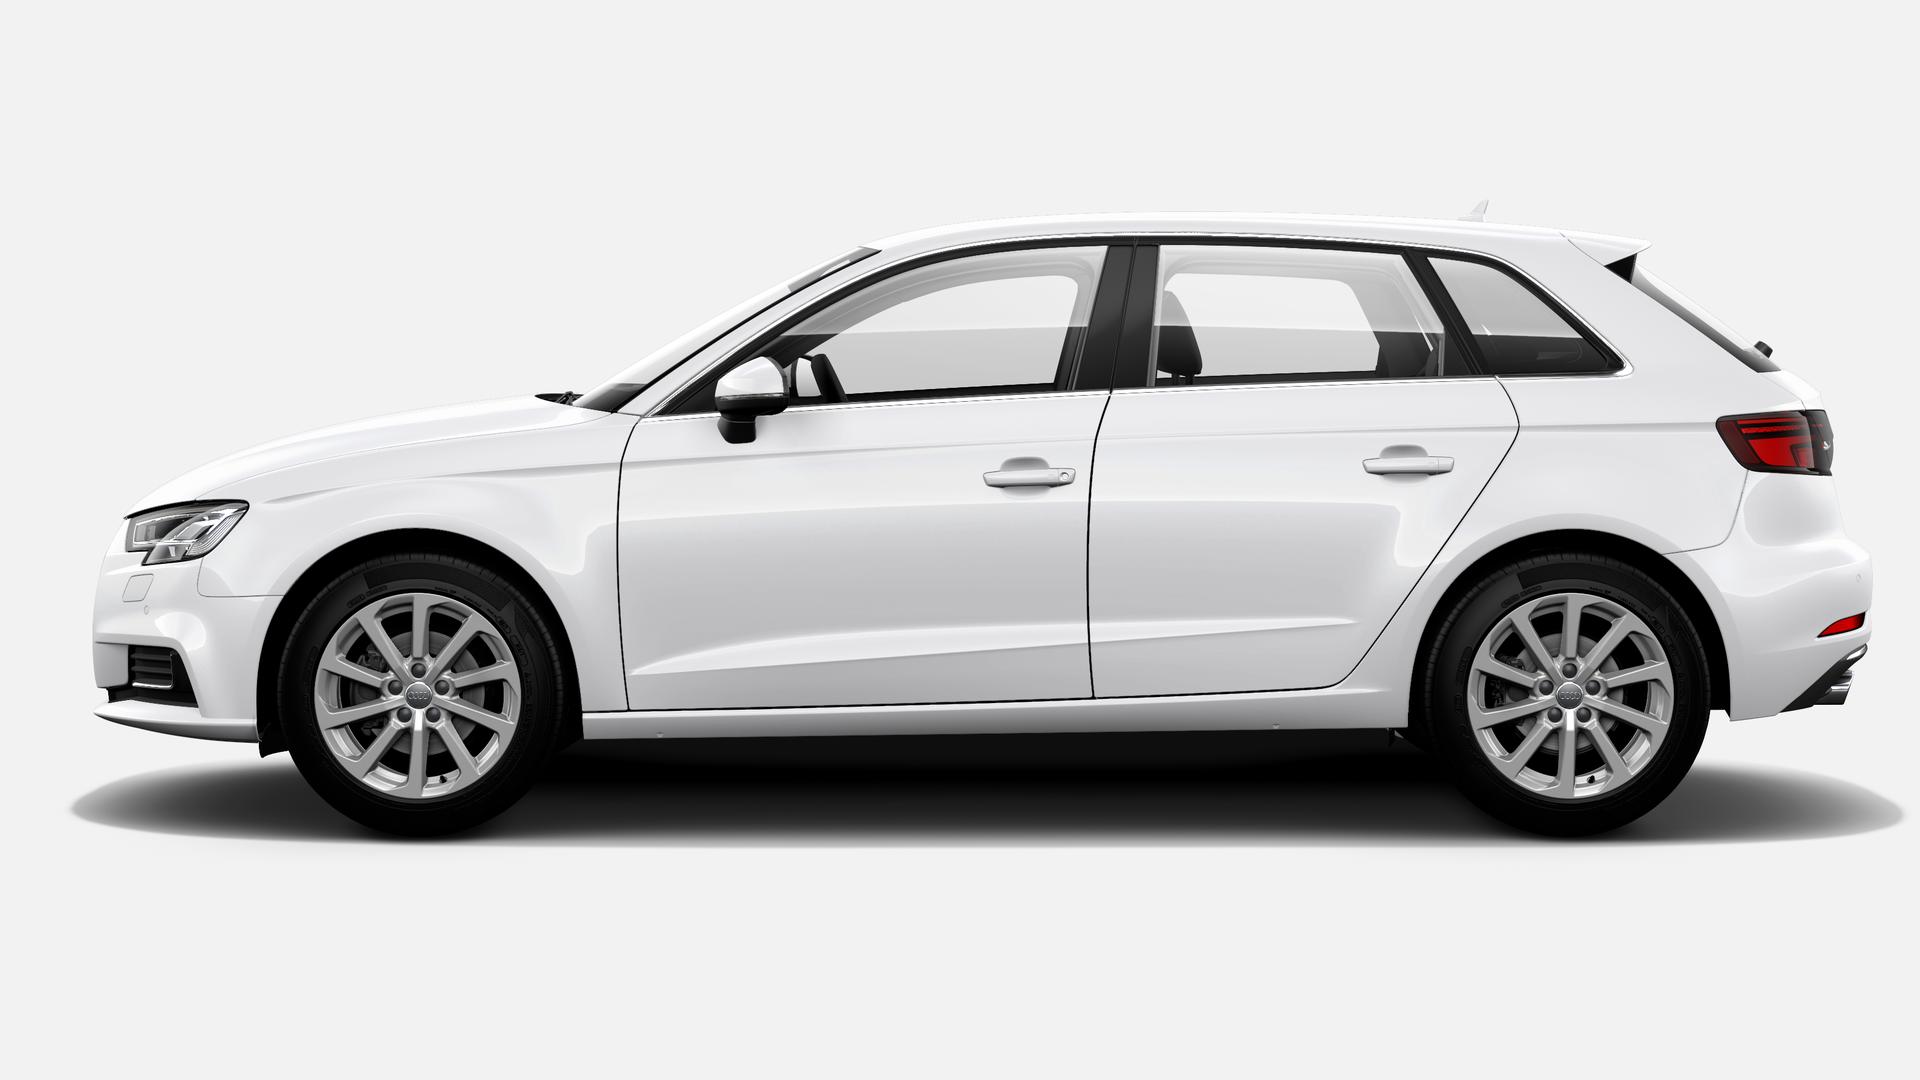 Vista Lateral izquierda de Audi A3 Sportback 1.6 TDI Design Edition S-tronic 85 kW (116 CV)